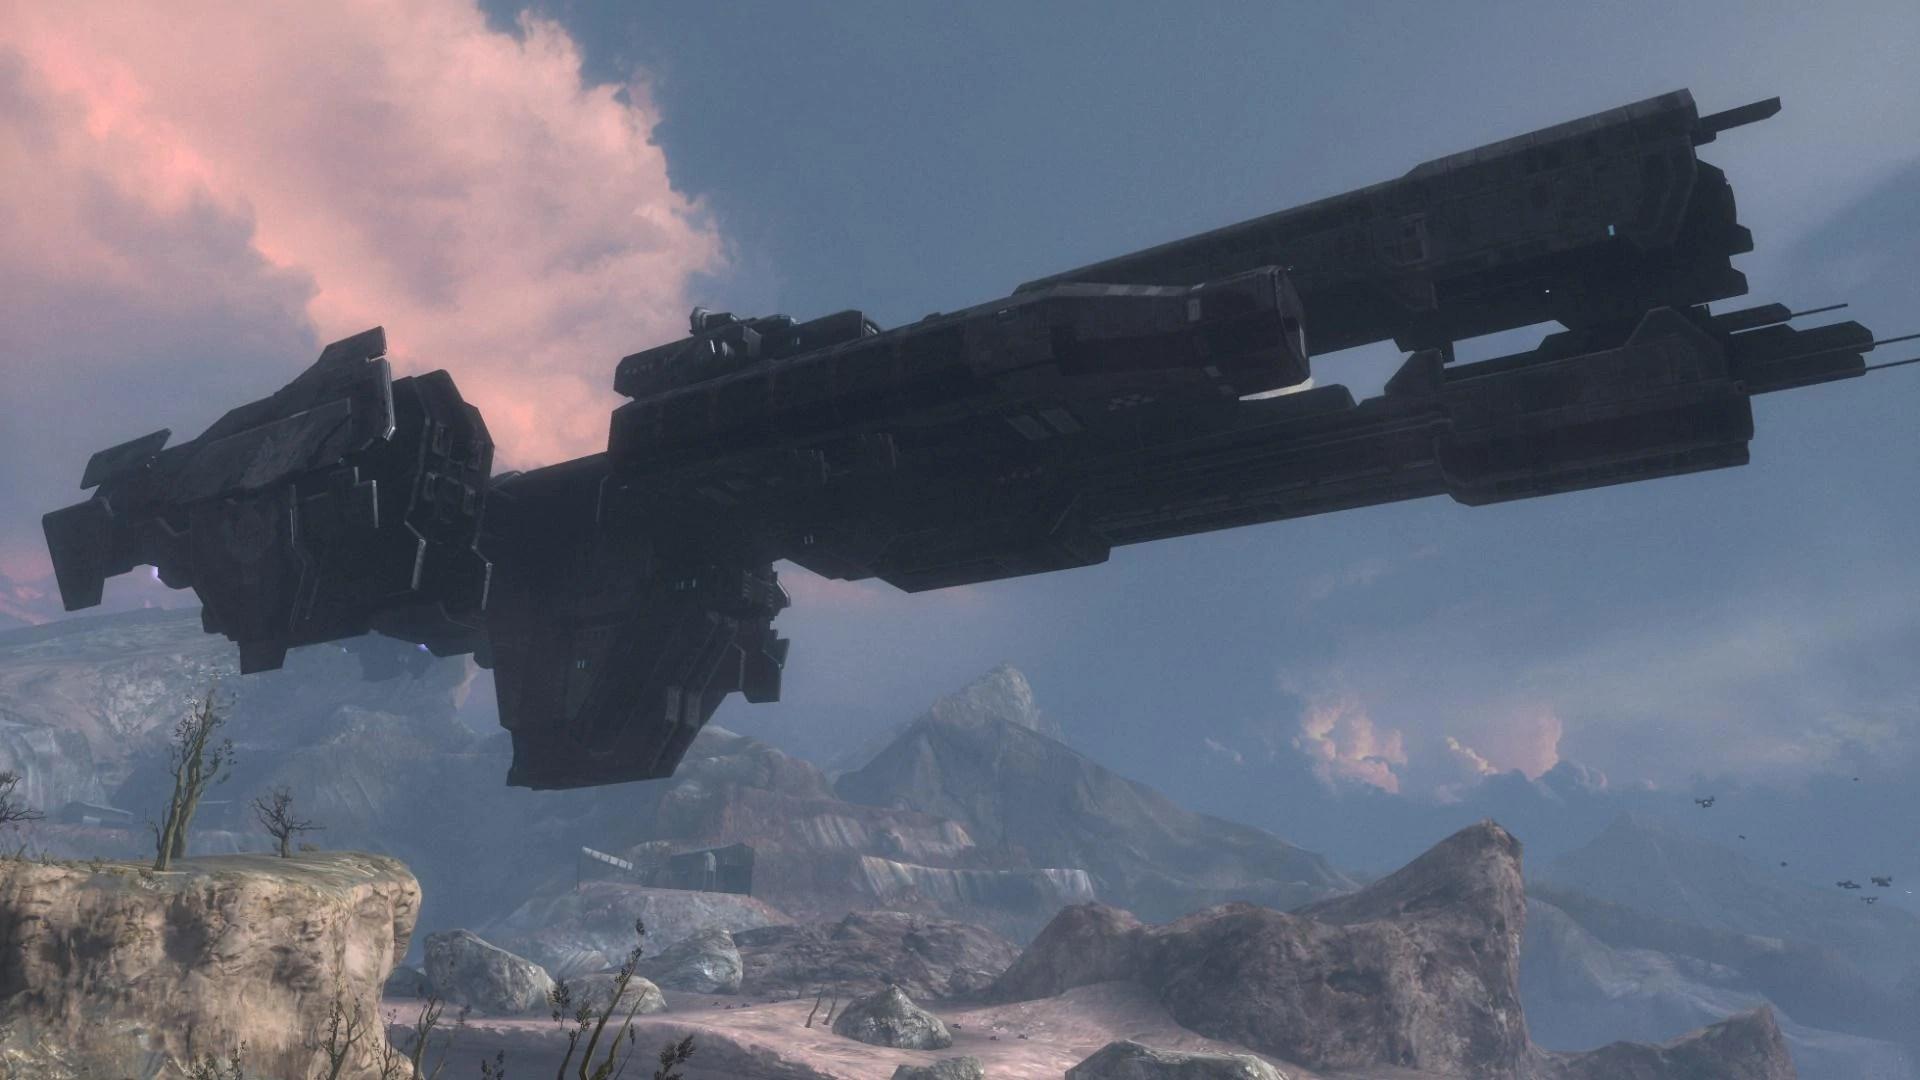 Halo Wallpaper Fall Of Reach Unsc New Alexandria Halo Redemption Wiki Fandom